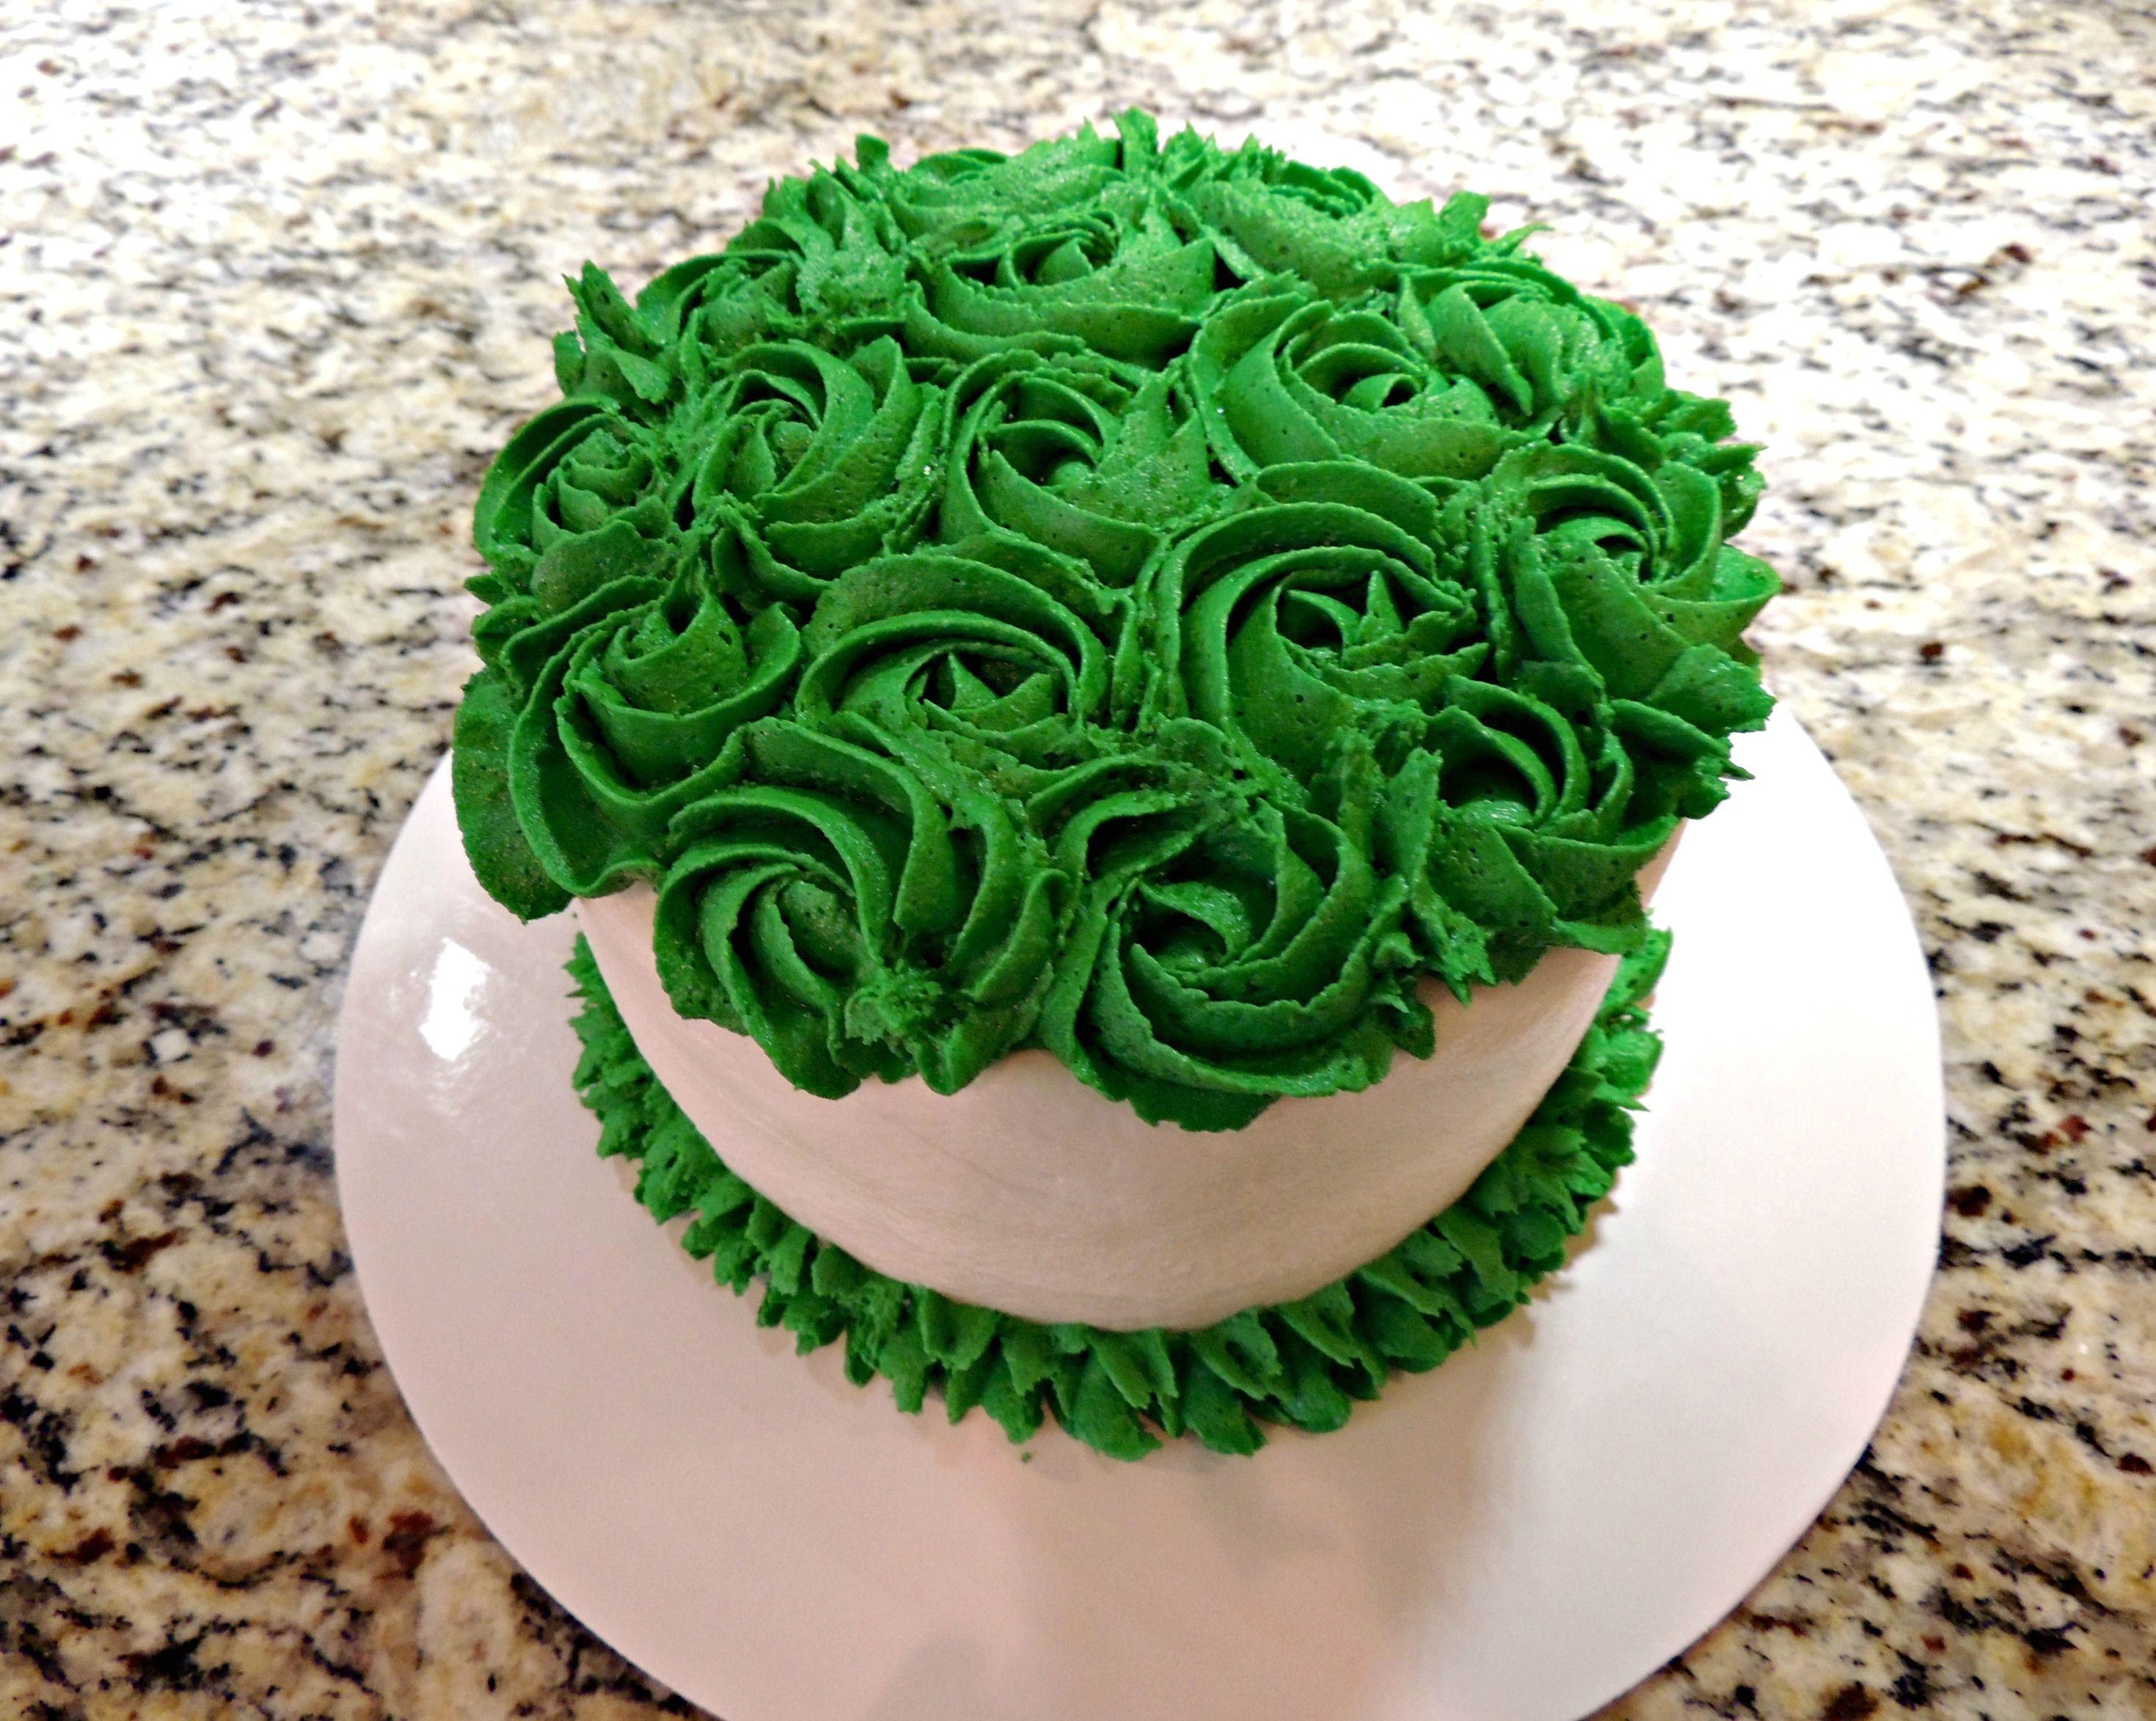 Cake Decorating St Patrick Day : St. Patrick s Day Cake Cake decorating Pinterest